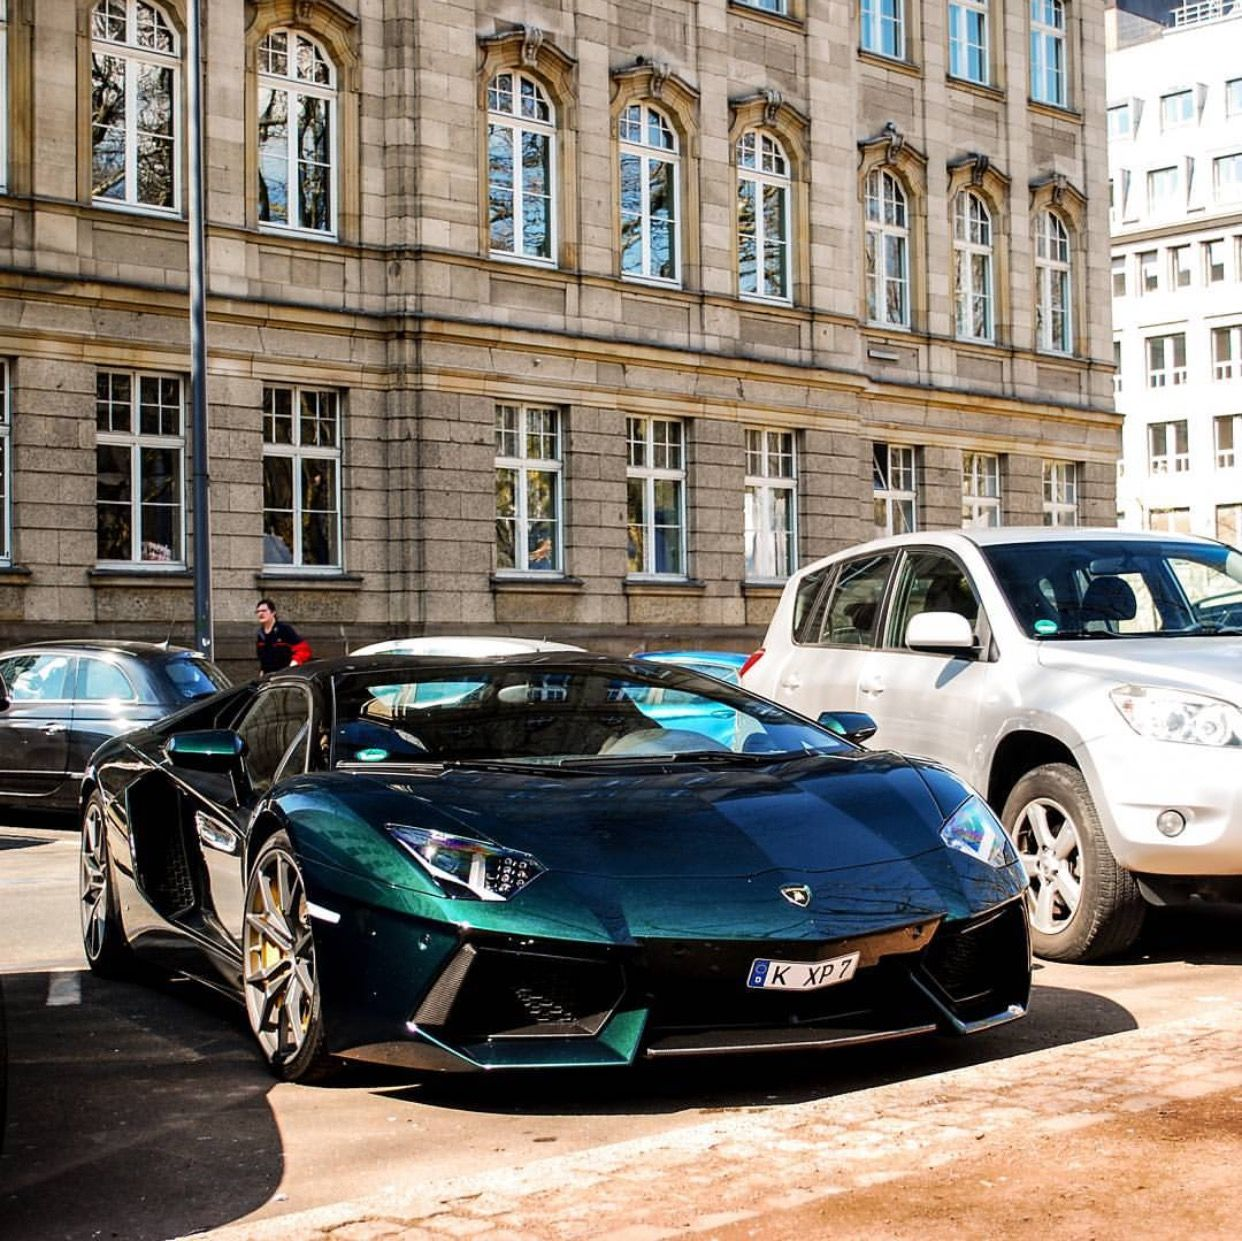 Lamborghini Aventador Roadster Painted In Verde Hydra Photo Taken By:  @next_gear On Instagram